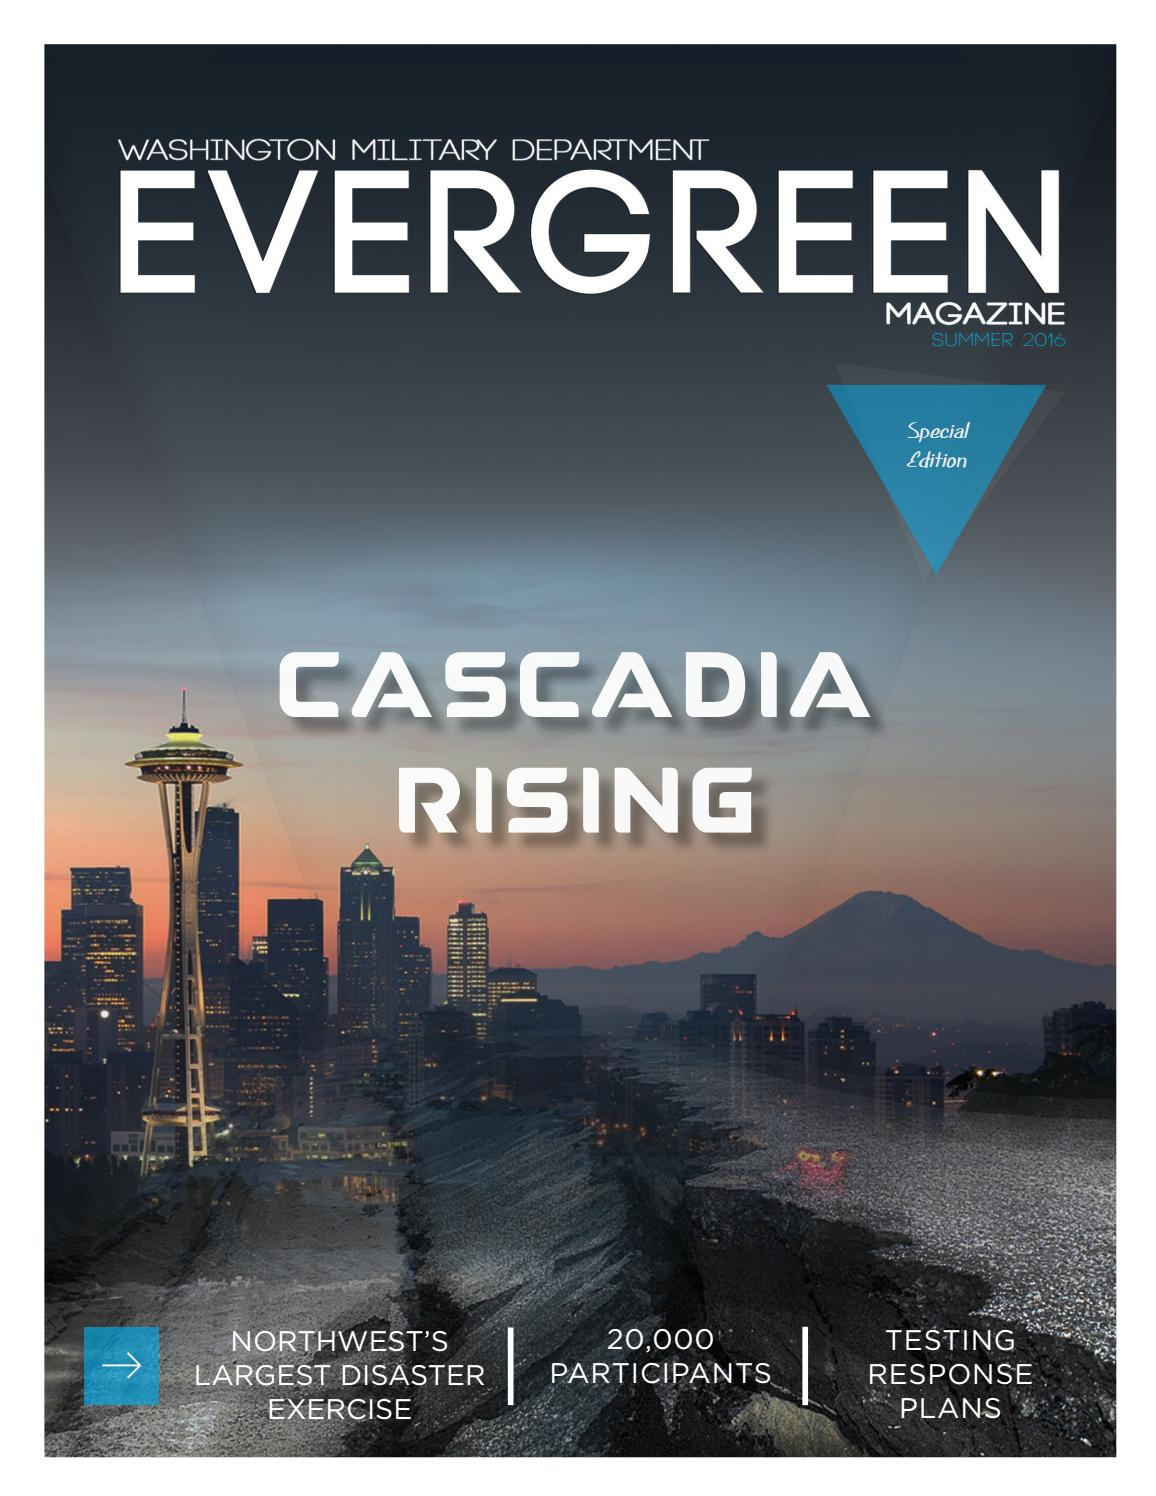 Evergreen magazine cascadia rising by washington military for Evergreen magazine